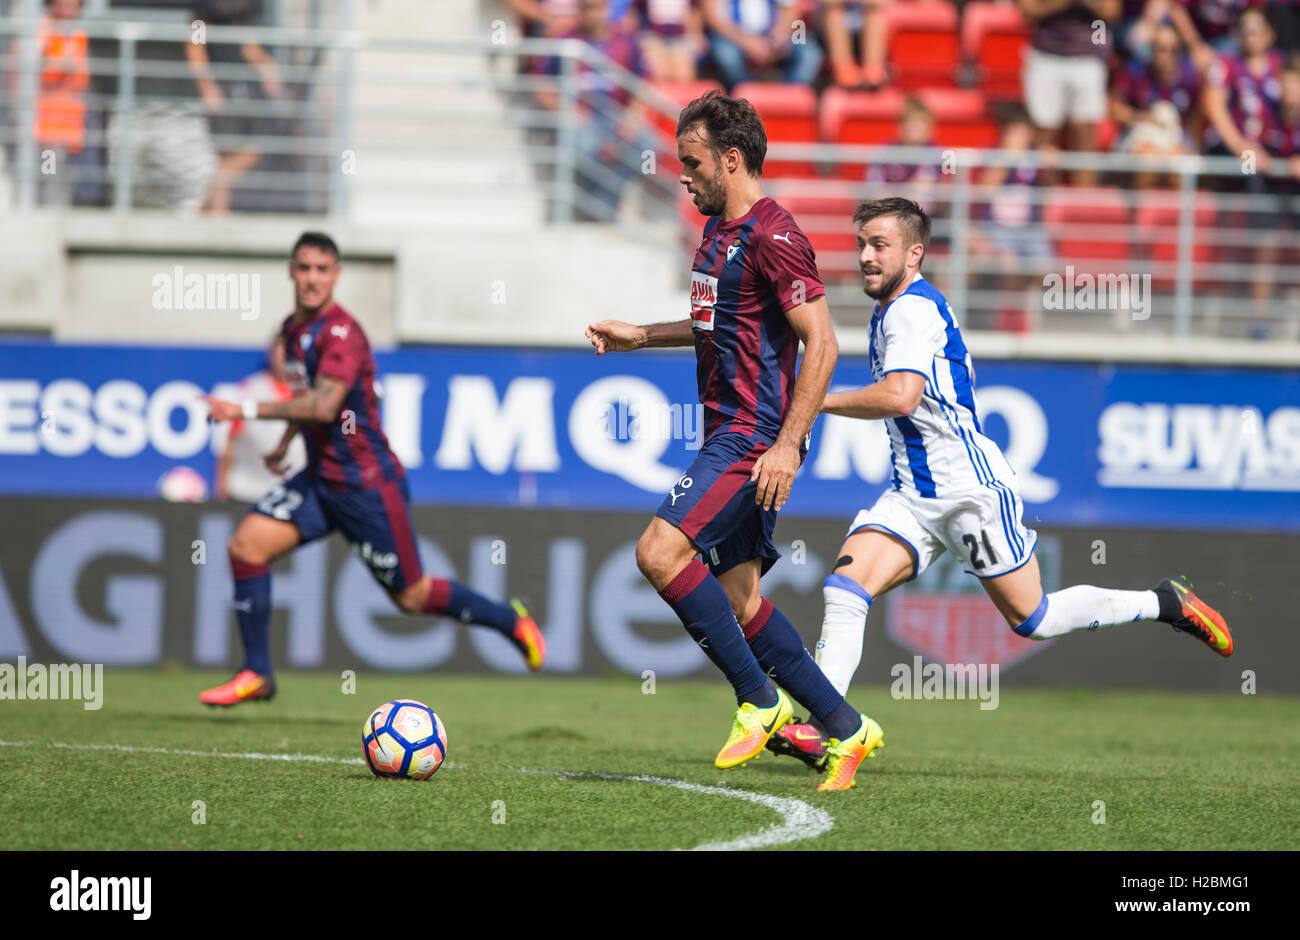 21 Pedro leon attack. Match day 6 game of la Liga Santander 2016-2017 season between Sd Eibar and Real Sociedad - Stock Image